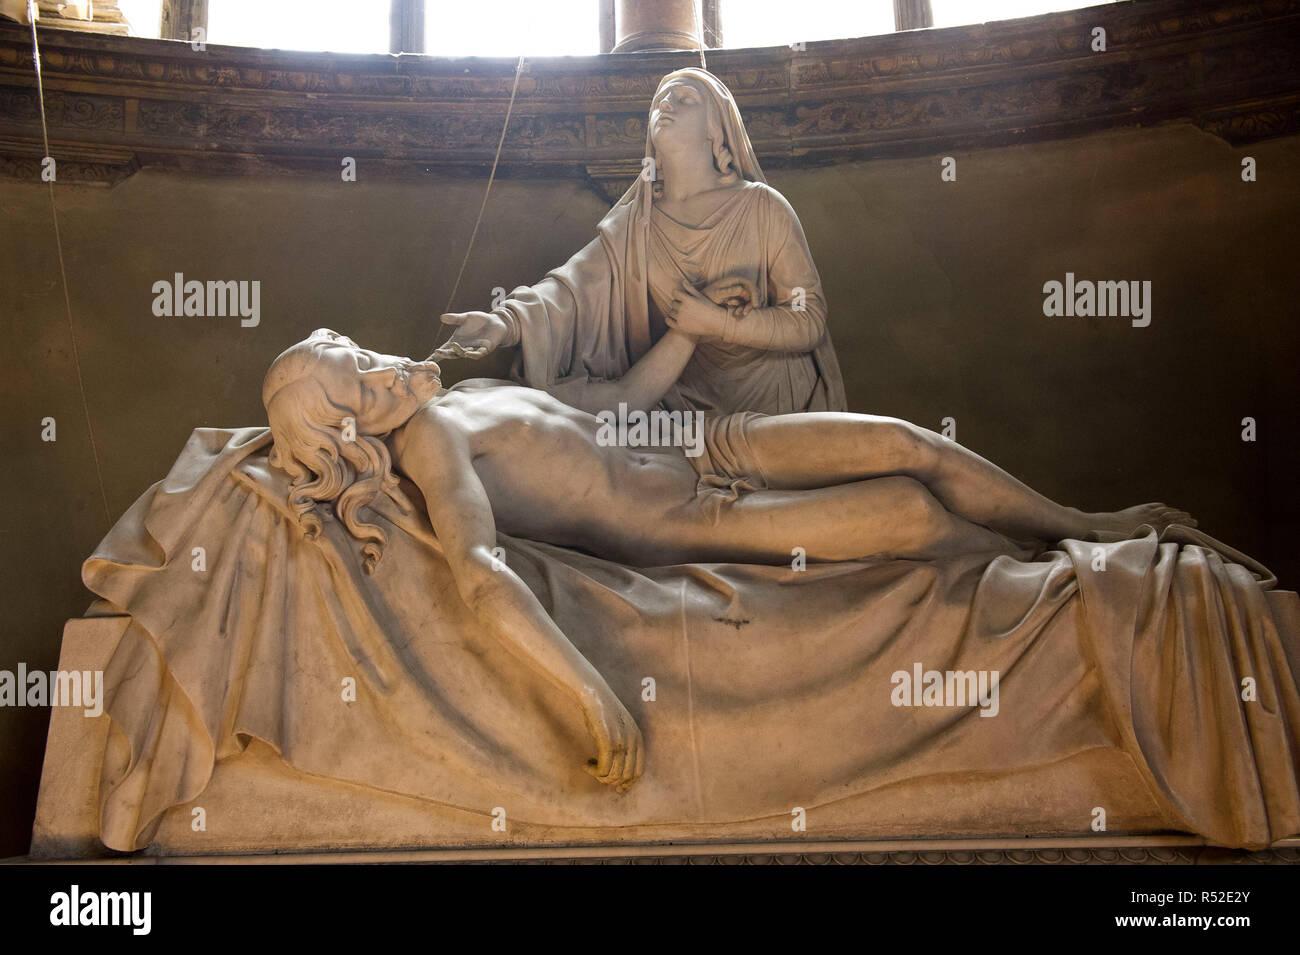 Italy, Emilia Romagna, Parma, Basilica of S. Maria della Steccata, frescoes by Parmigianino, funeral monument in marble, piety, - Stock Image